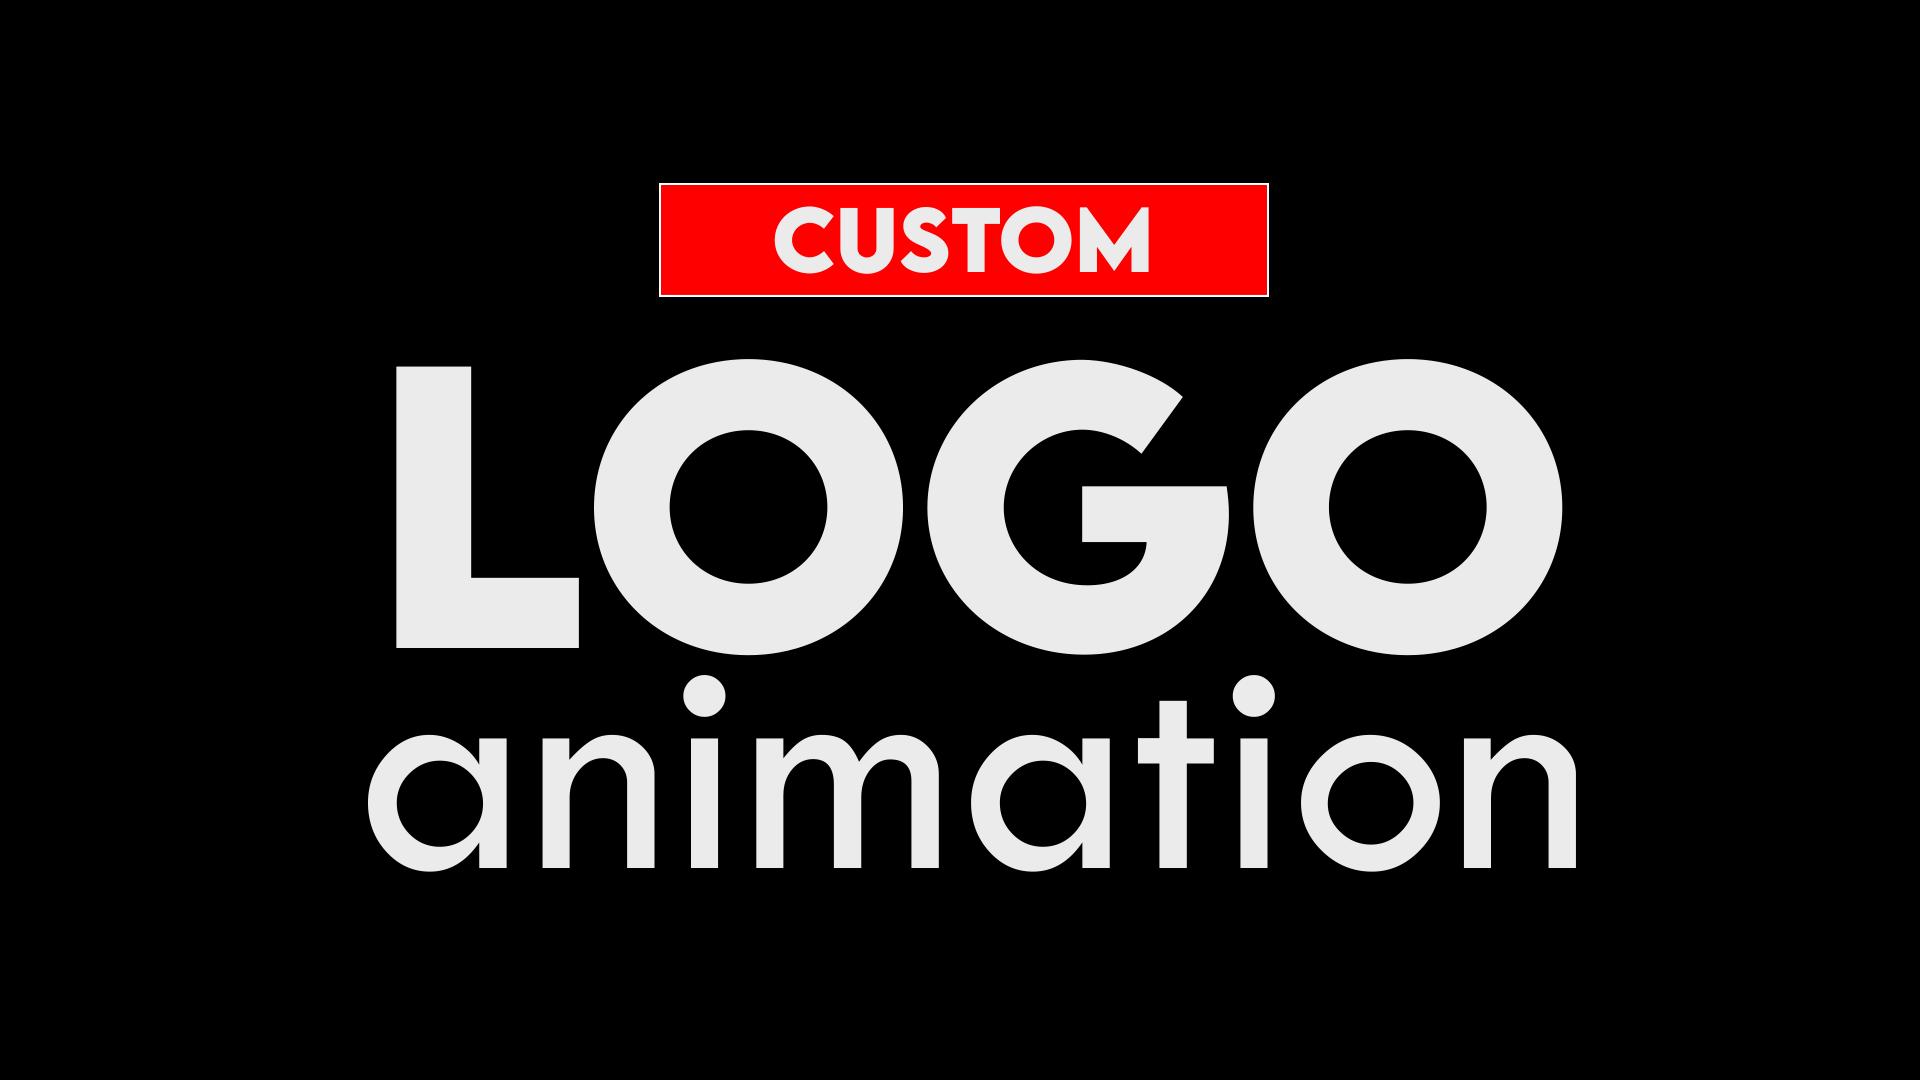 I will be custom make logo animation, Intro or Outros